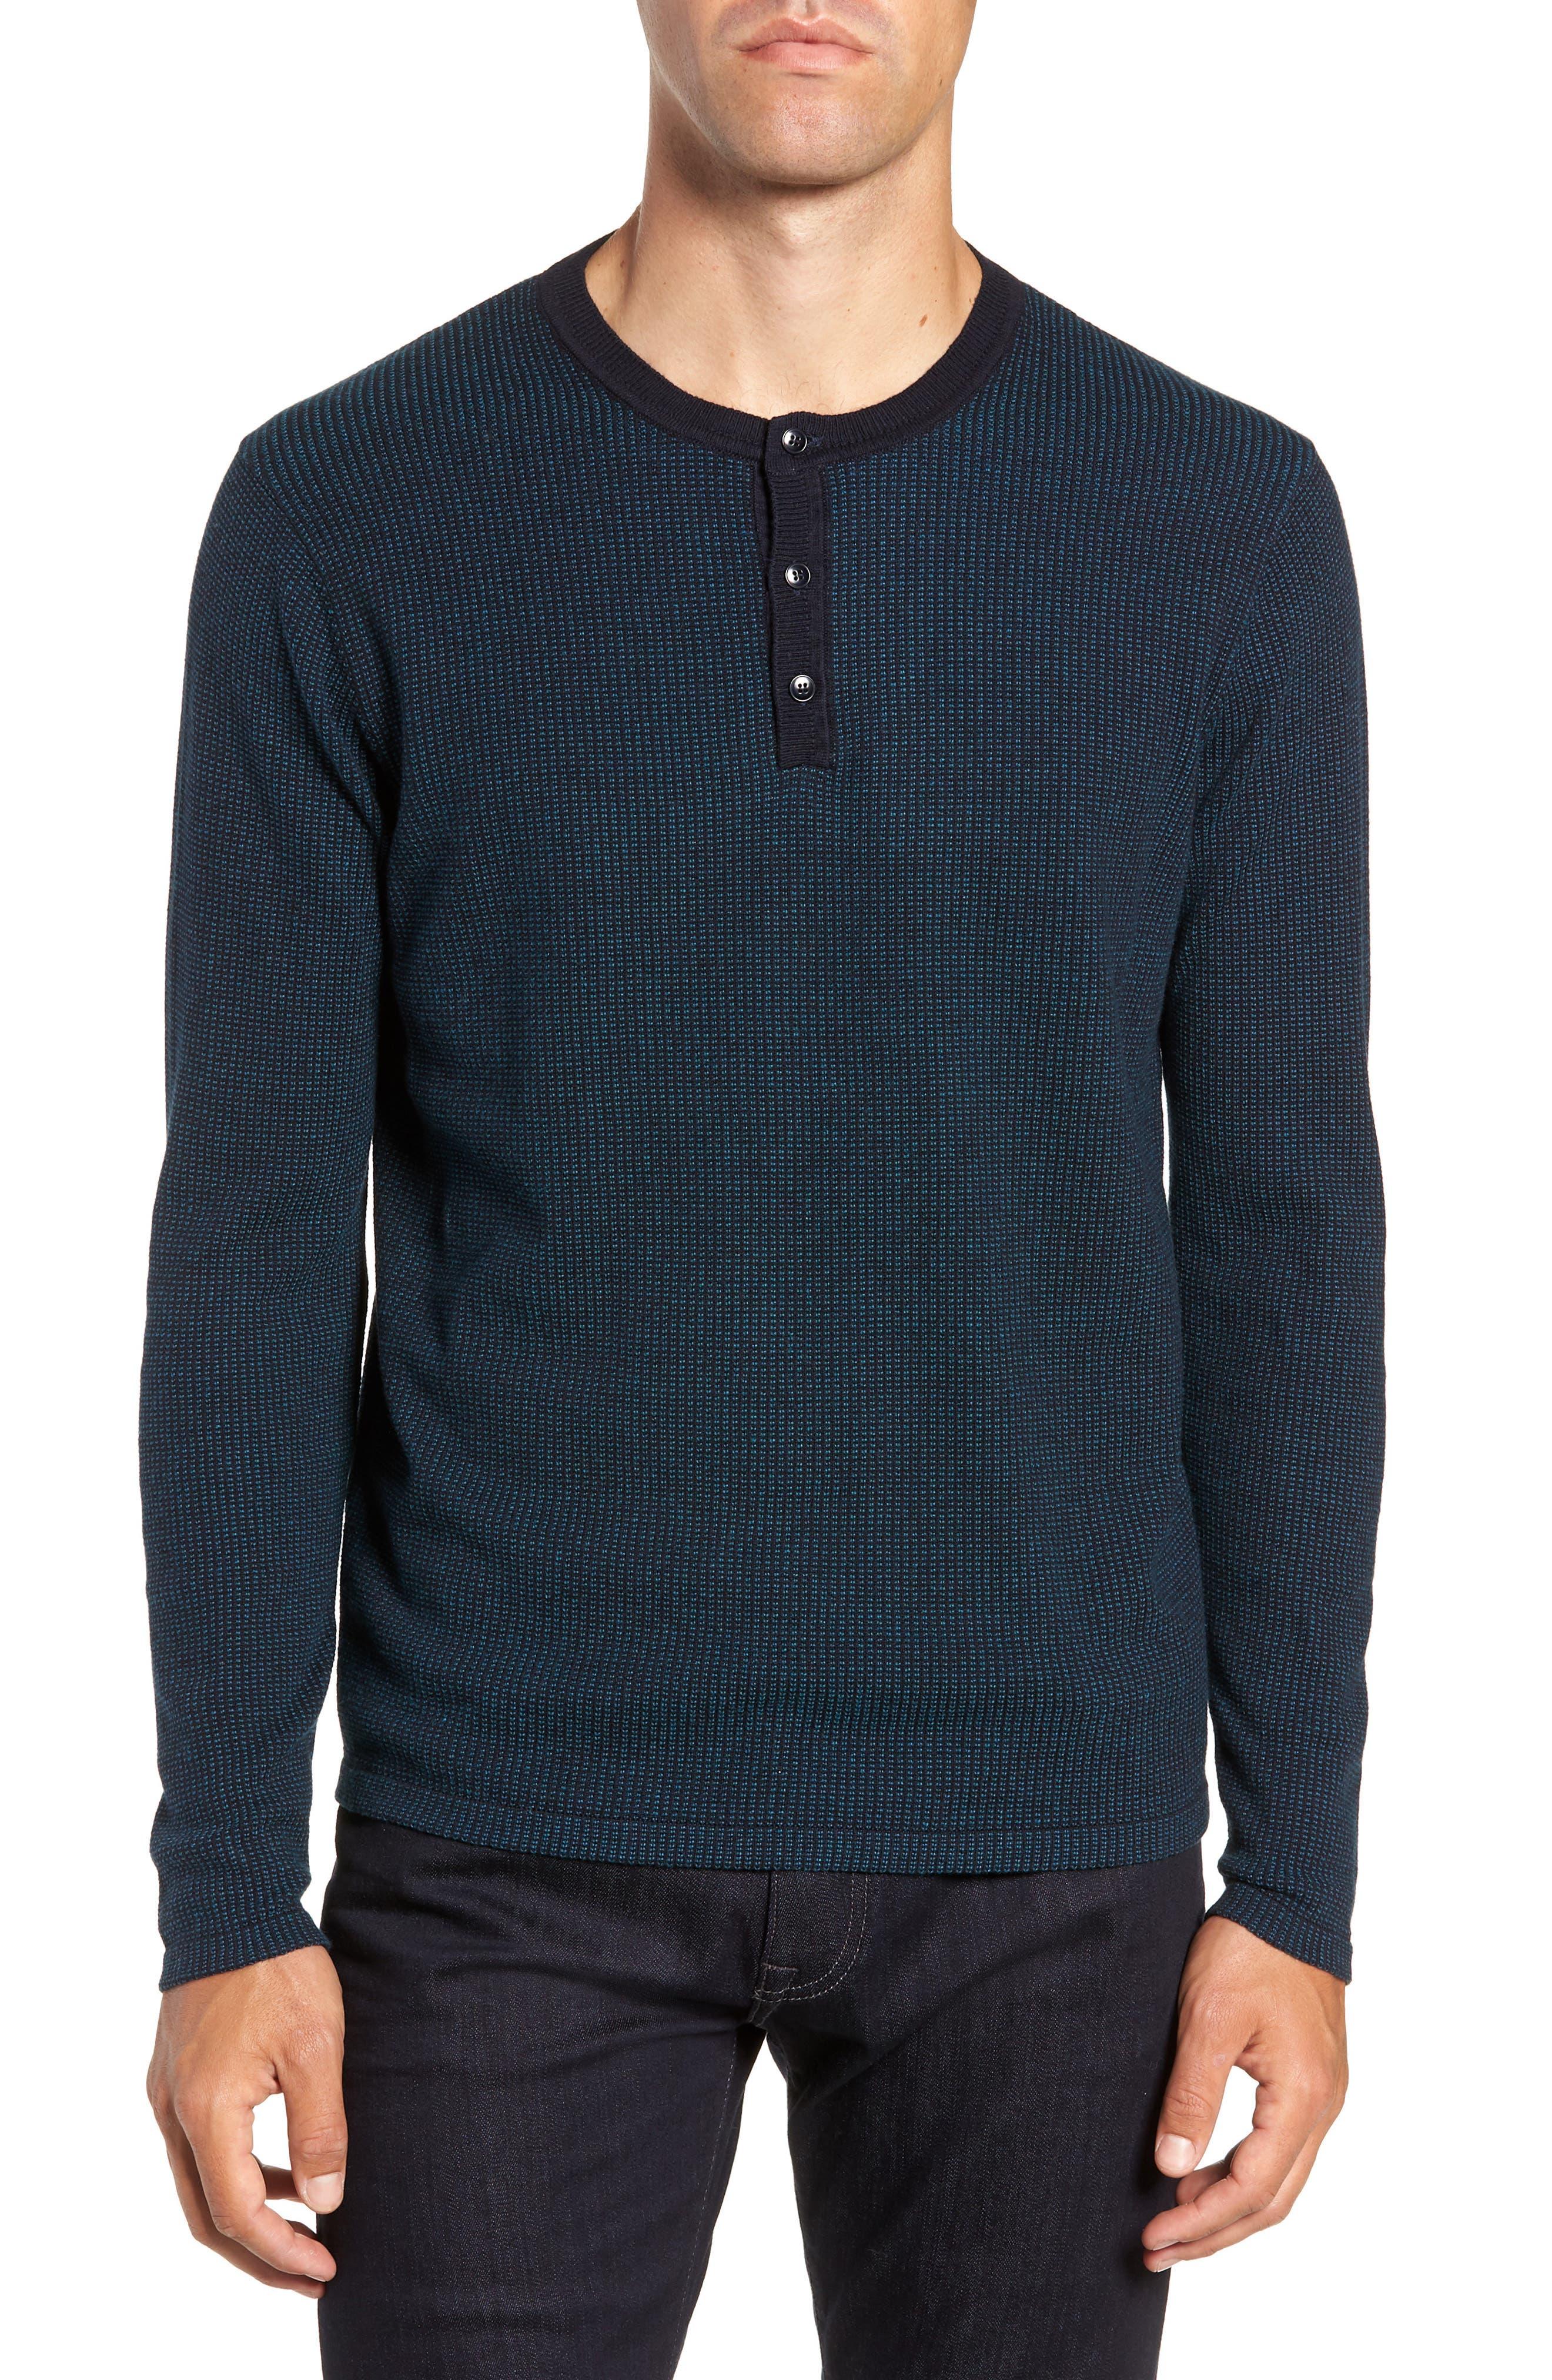 ZACHARY PRELL, Kimball Henley Sweater, Main thumbnail 1, color, EMERALD